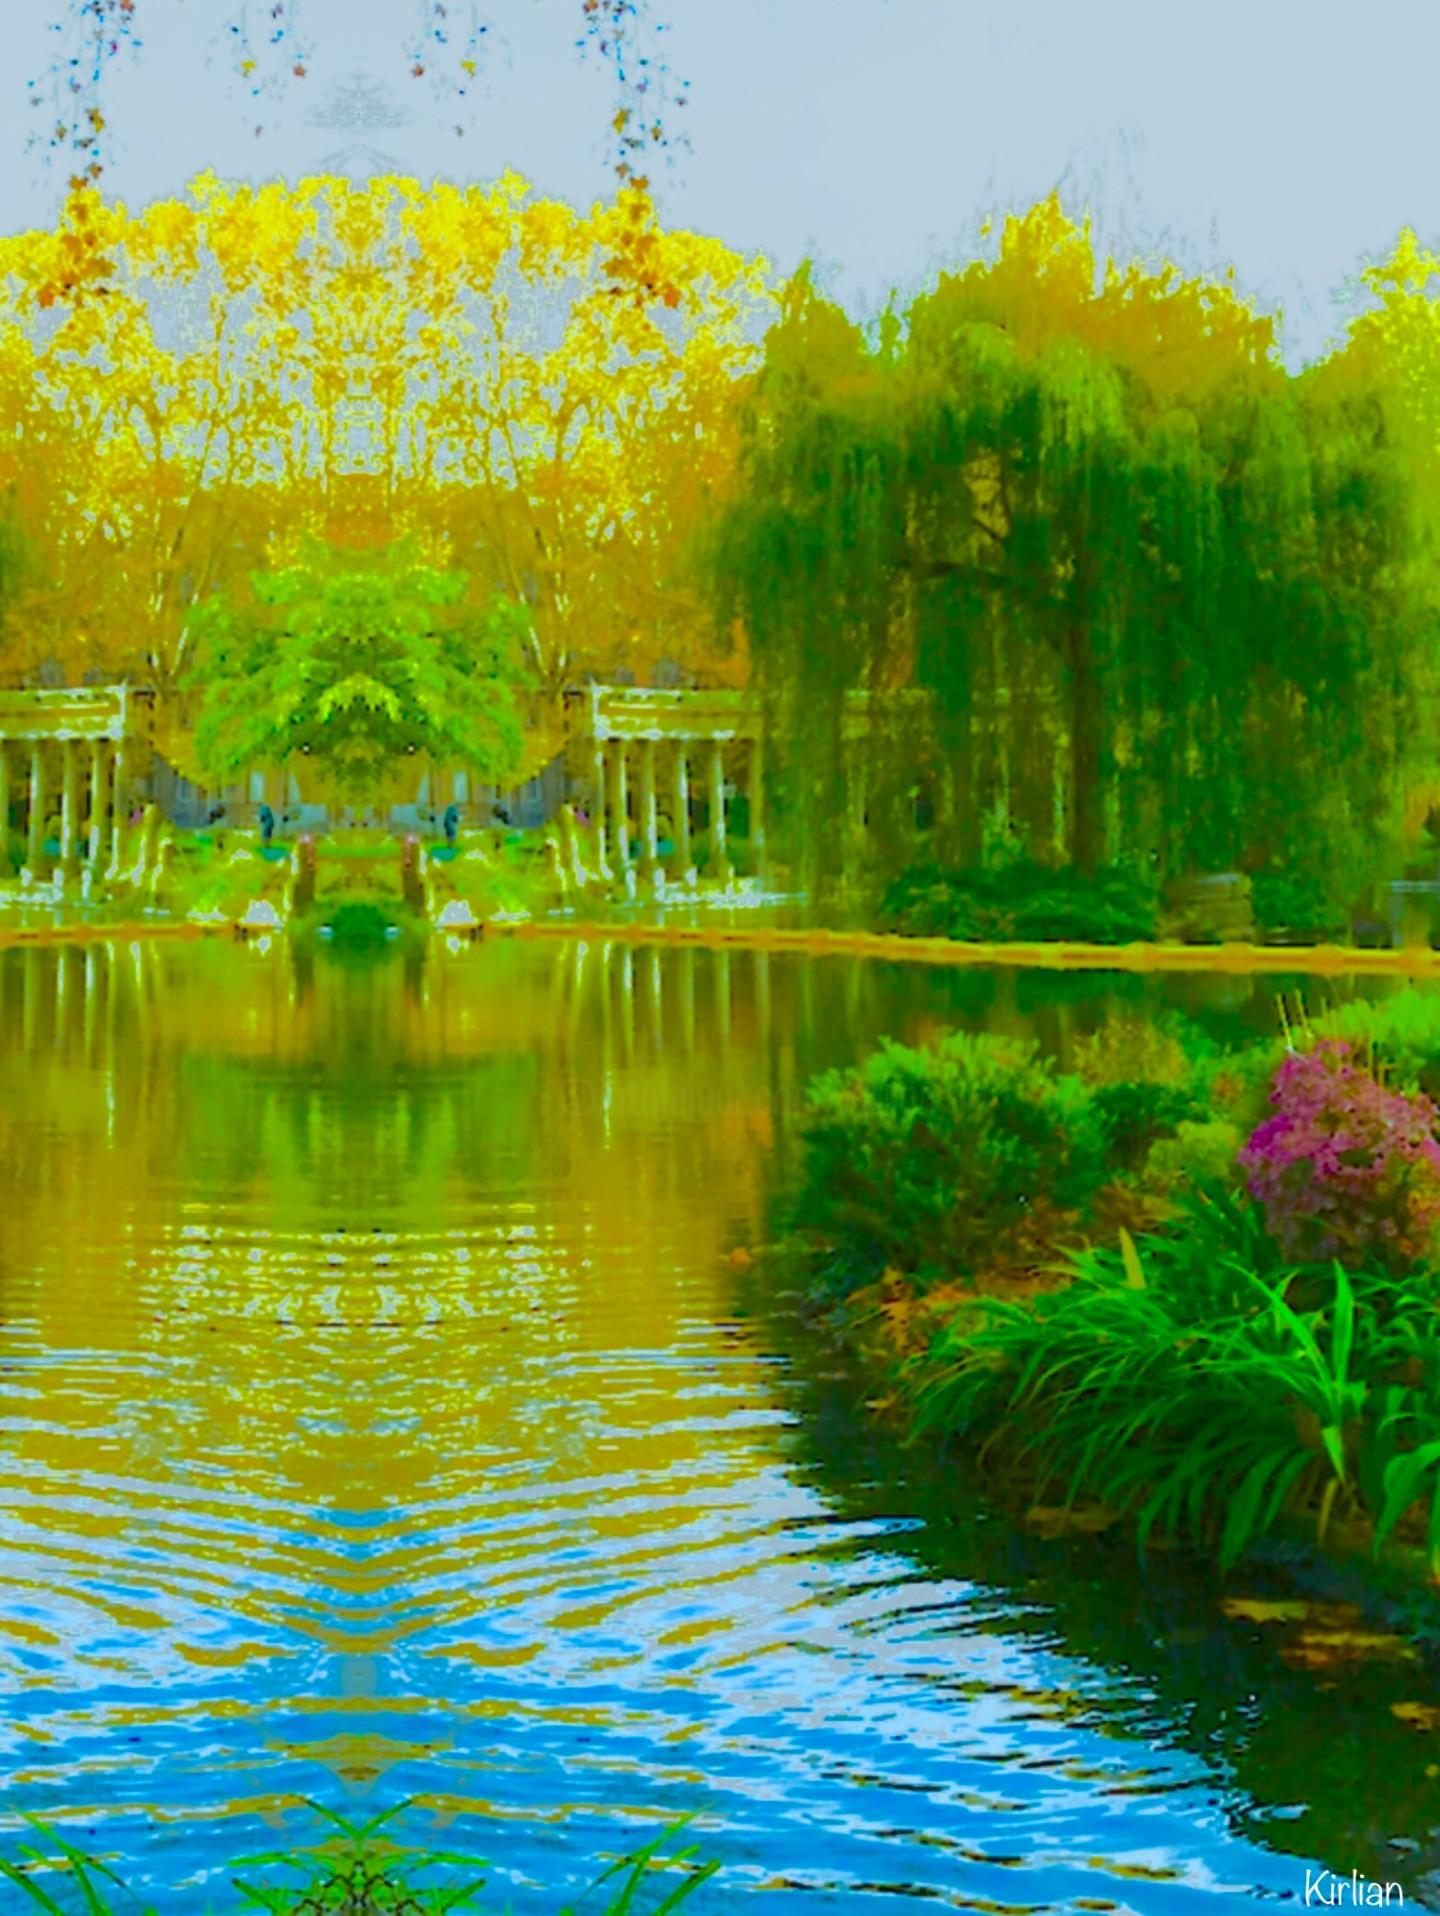 Kirlian - Symphonie pour Debussy #artistsupportpledge